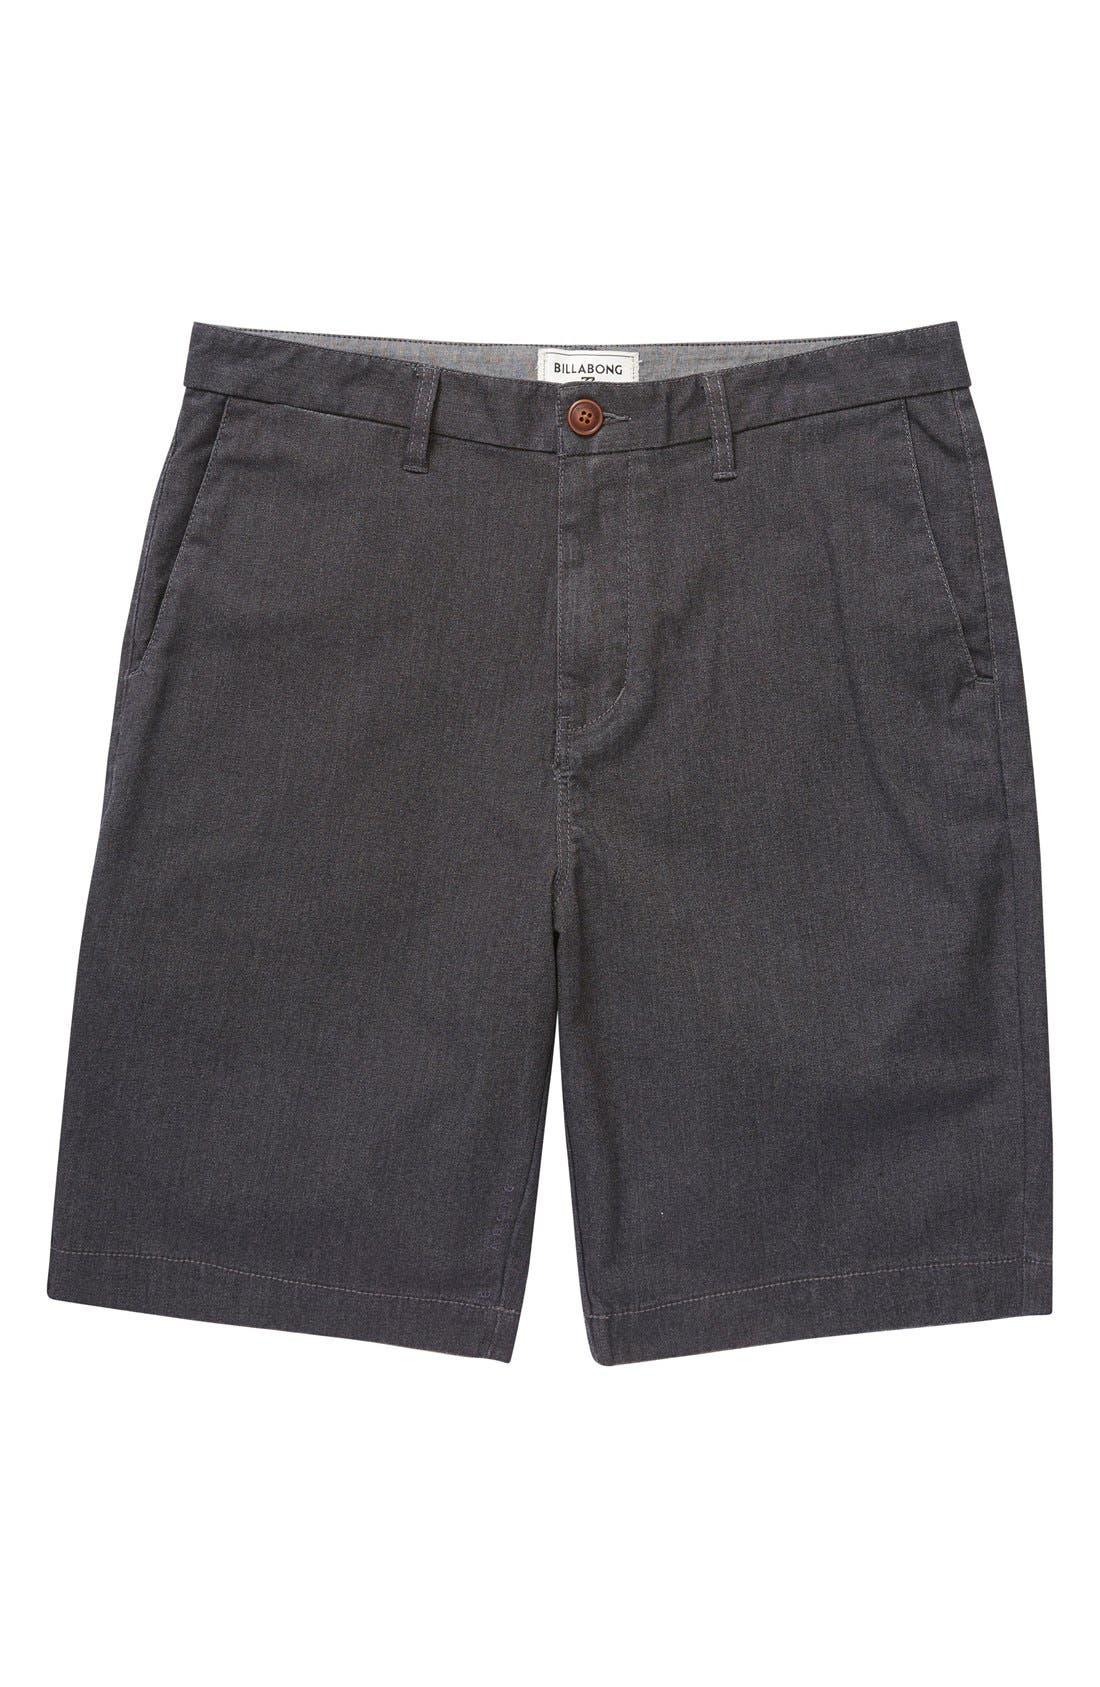 'Carter' Cotton Twill Shorts,                             Main thumbnail 1, color,                             001